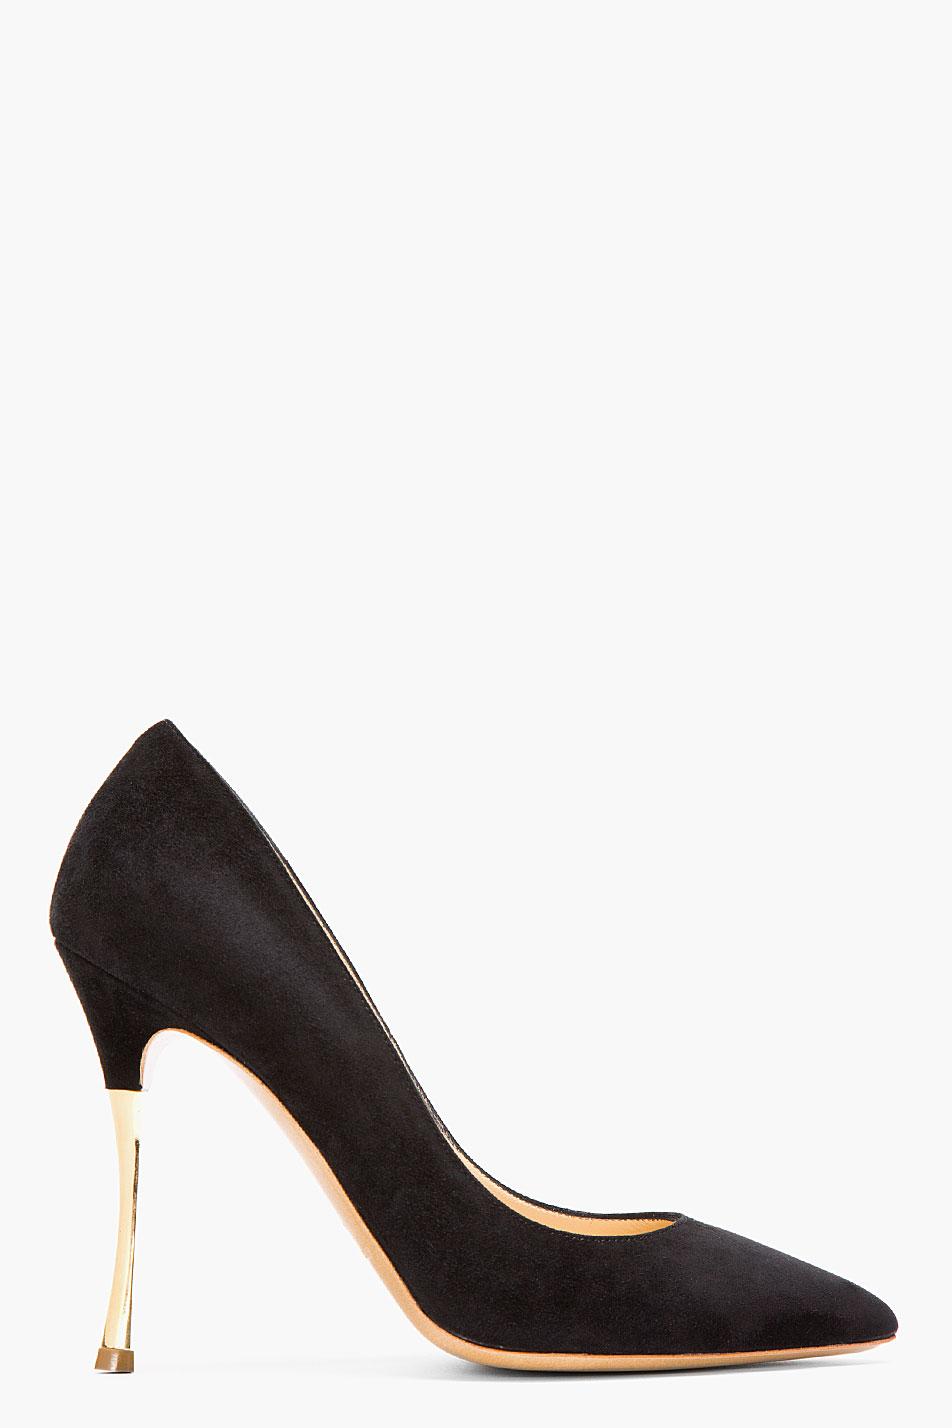 Black Pumps Gold Heel